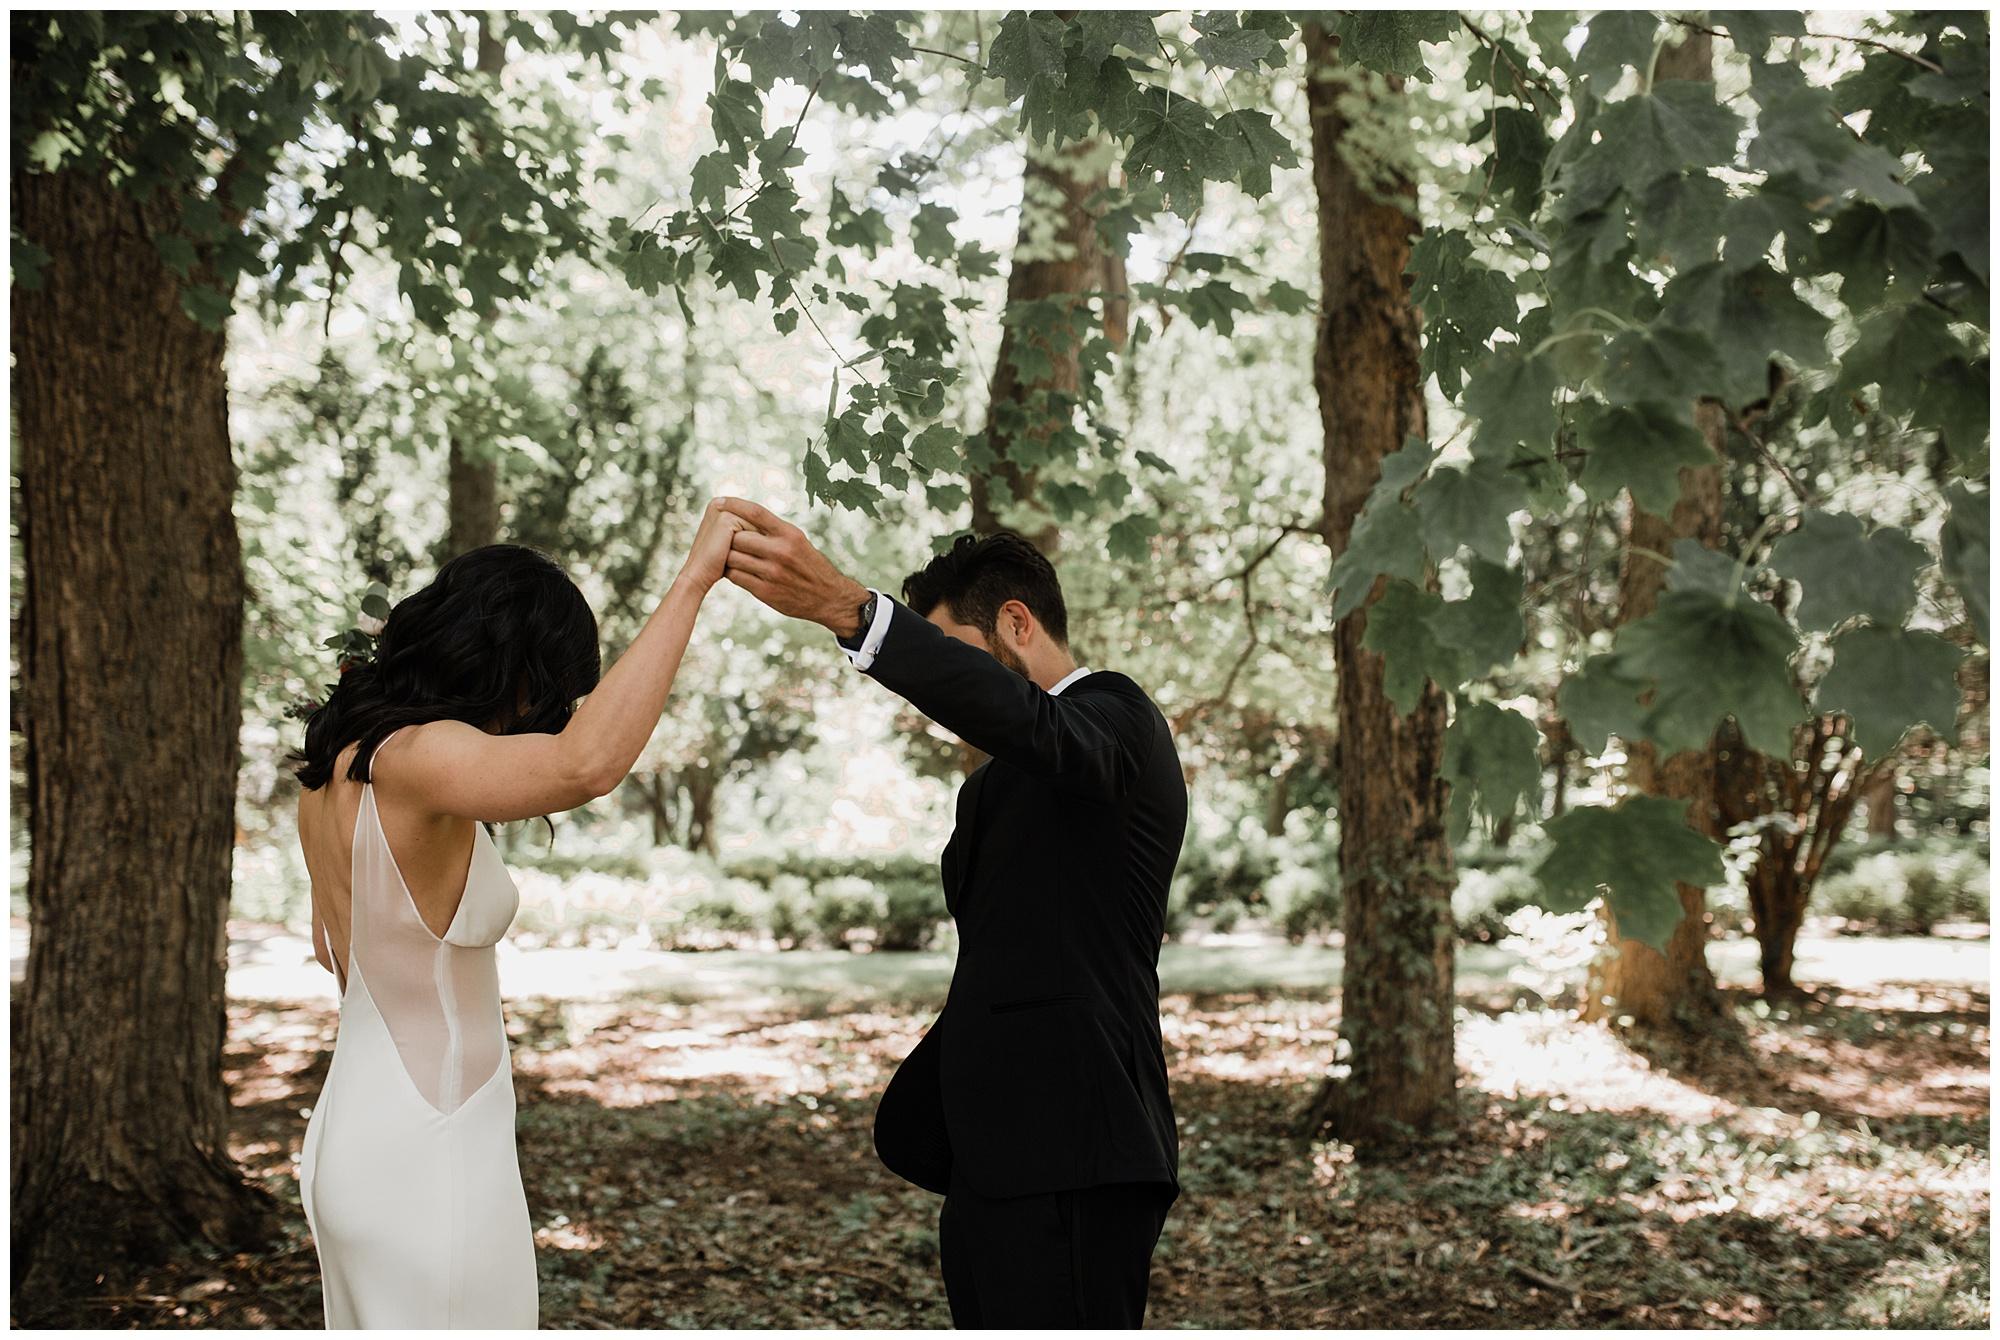 allerton_park_wedding_champaign_il_chicago_wright_photographs_ne_0051.jpg